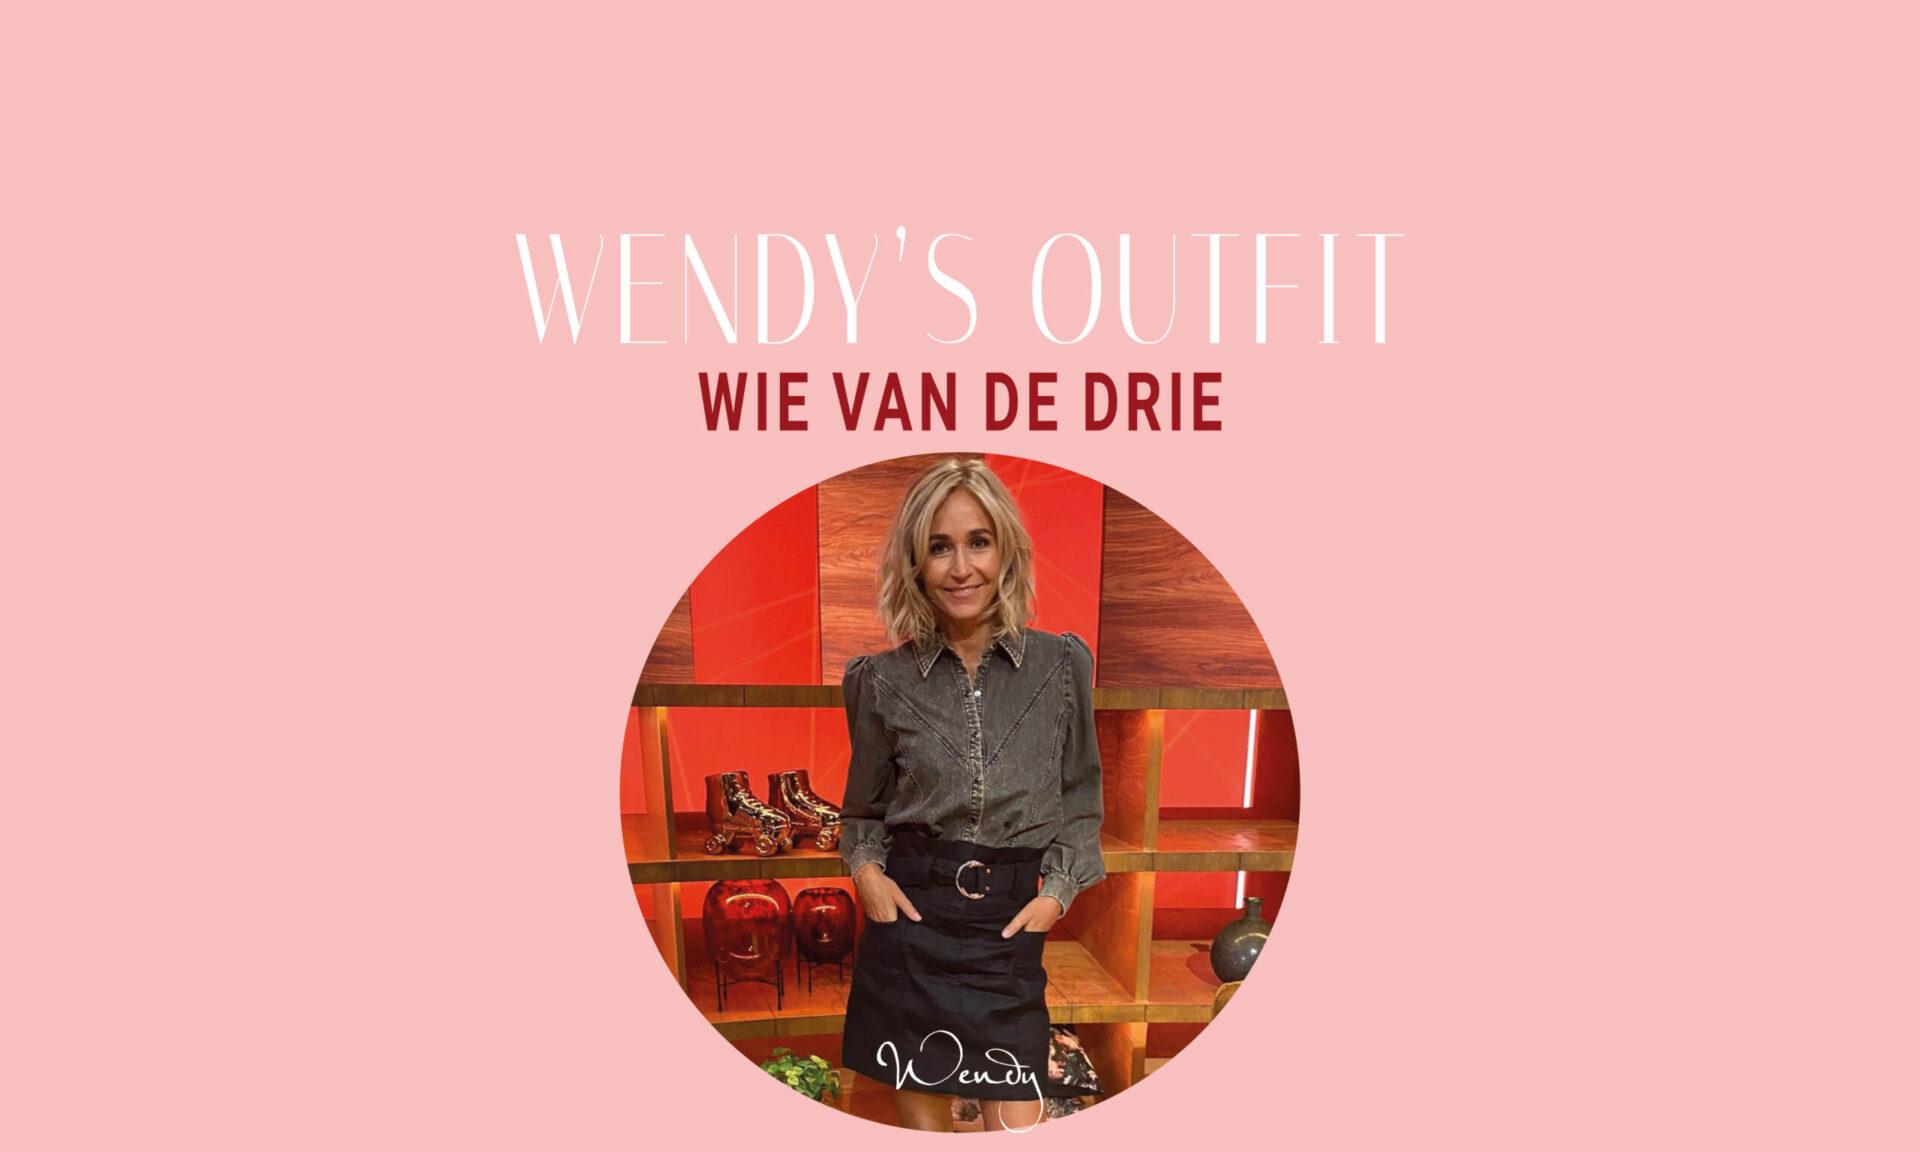 wendy outfit wievd3 scaled Wendy's outfit: Wie van de drie (seizoen 3 afl. 2)